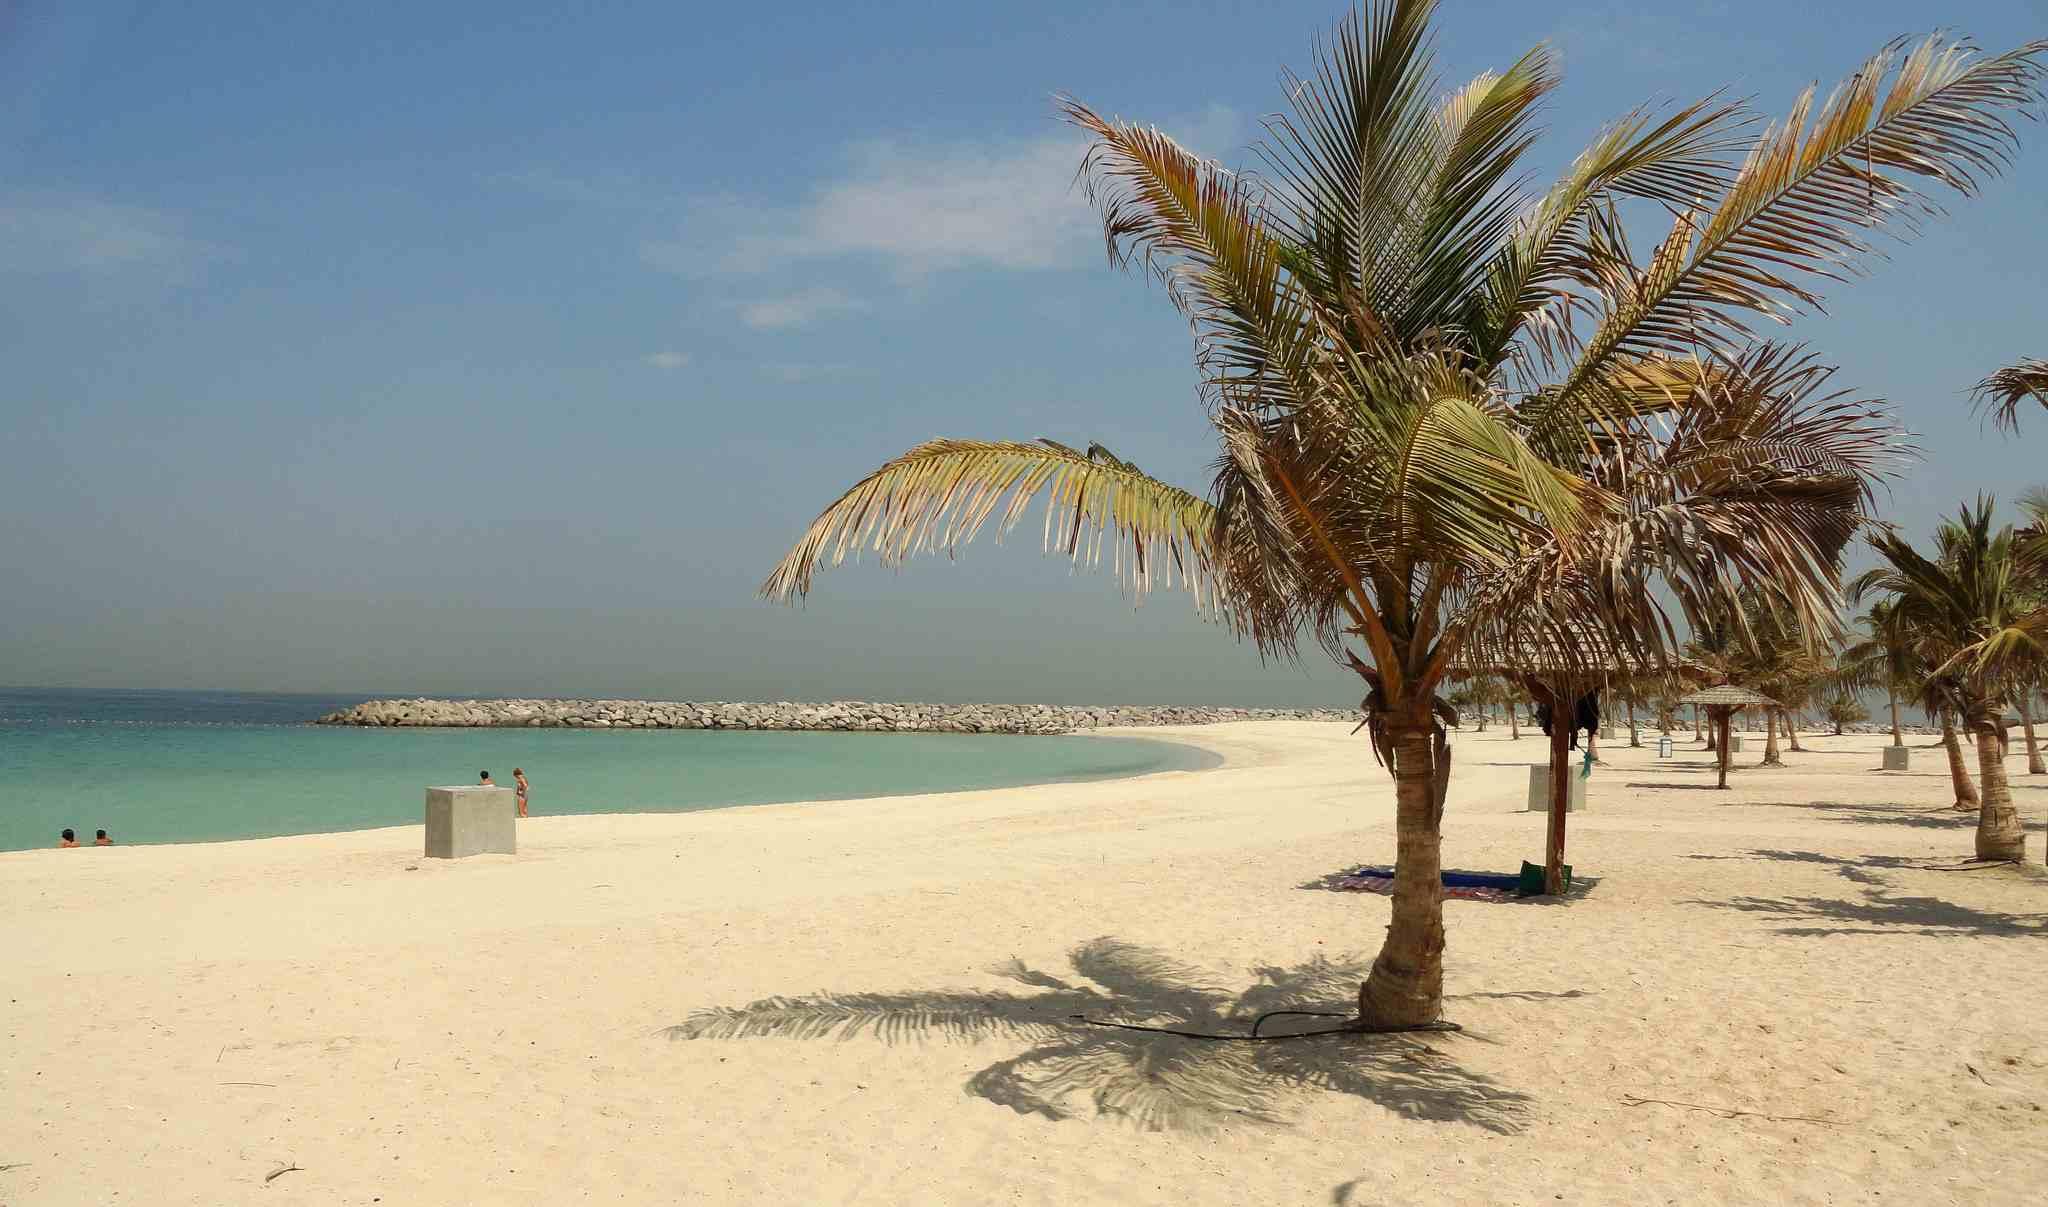 Фото пляжа Мамзар